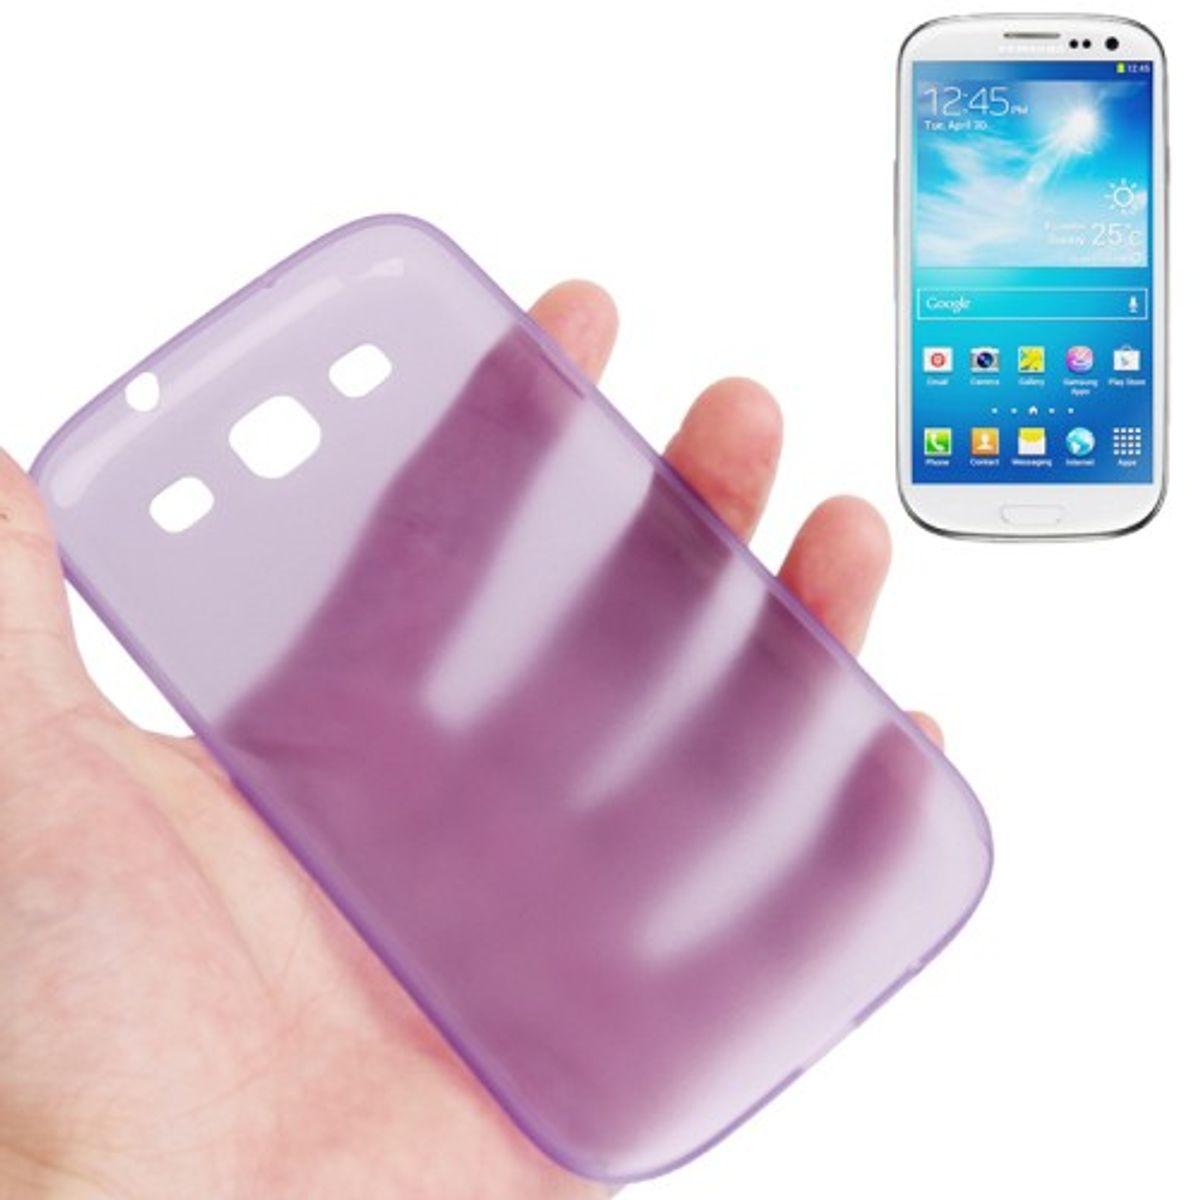 Schutzhülle Case Ultra Dünn 0,3mm für Handy Samsung Galaxy S3 i9300 / i9305 / S3 NEO i9301 Lila / Violett Transparent